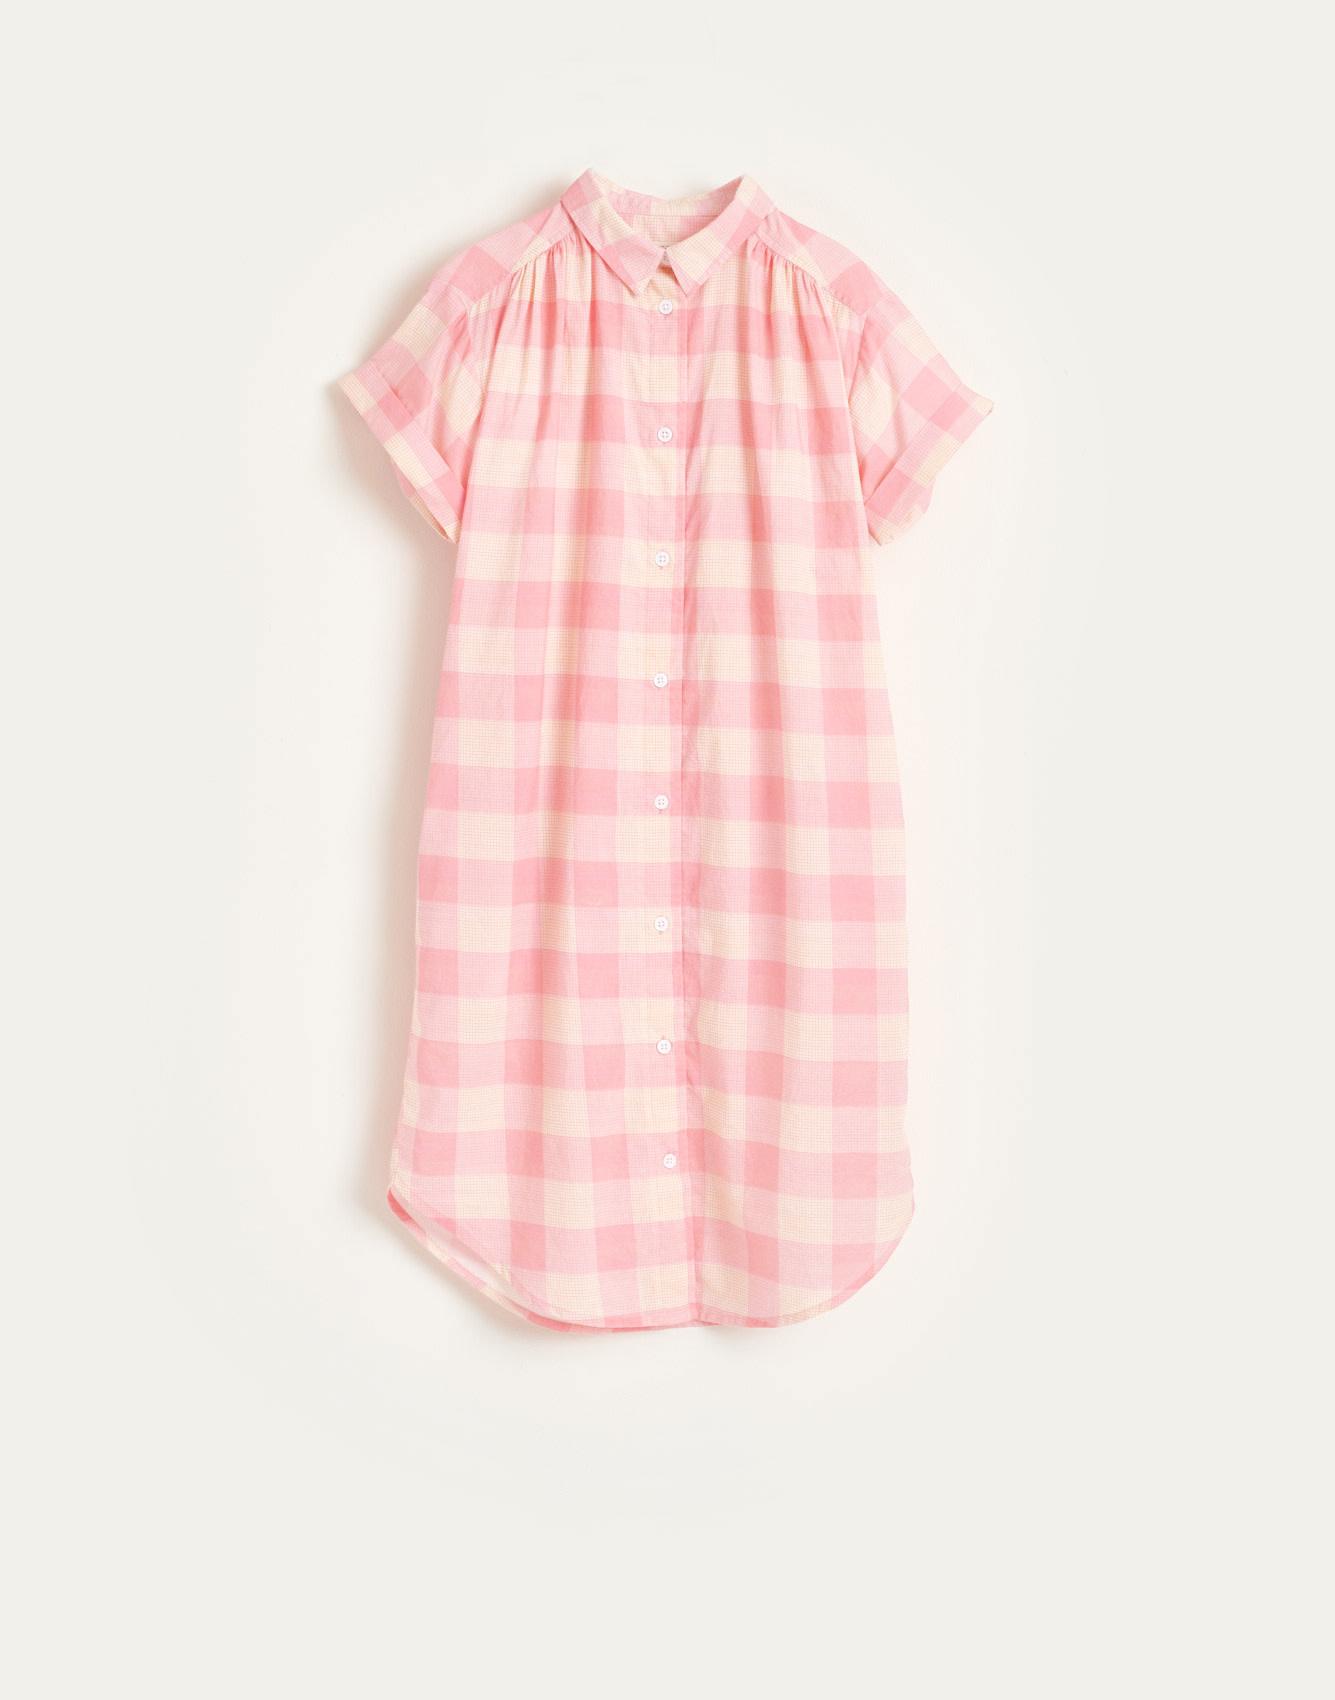 Angie dress check-4